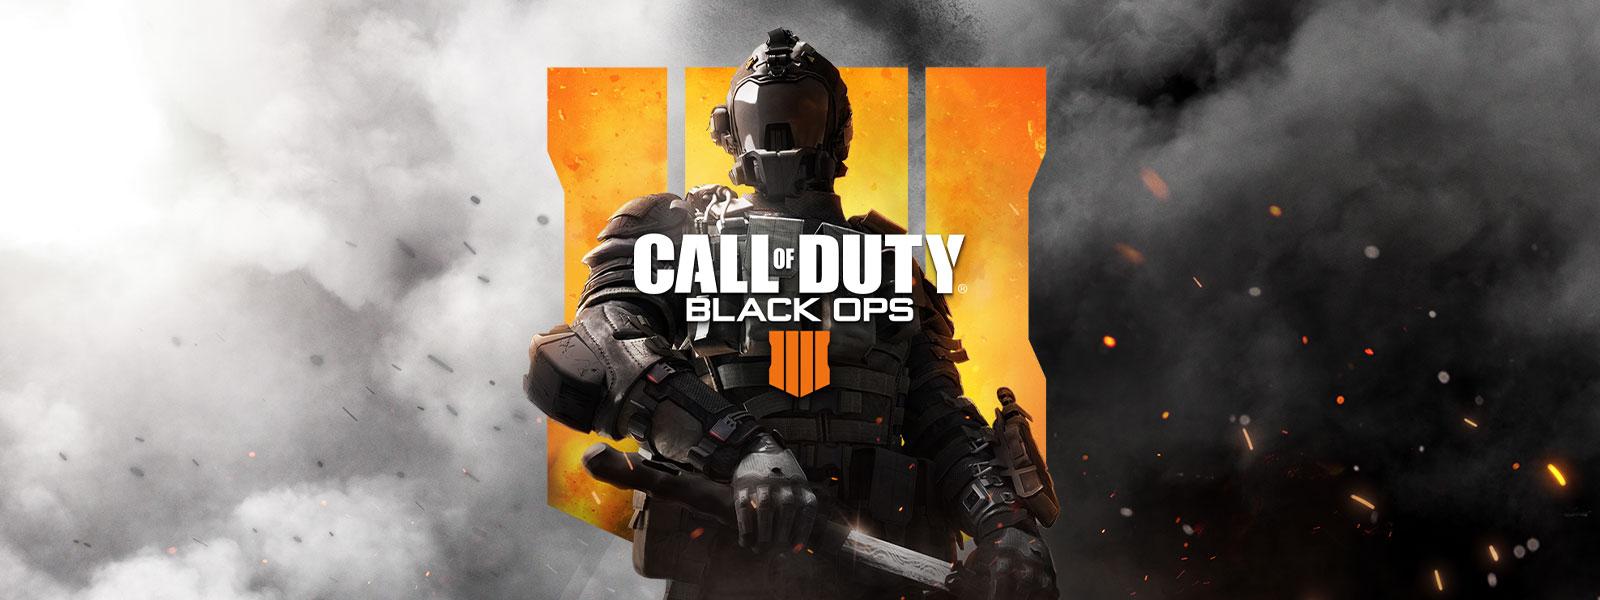 Call of Duty: Black Ops 4 - Digital Edition Xbox One [Digital Code] -  Newegg.com -